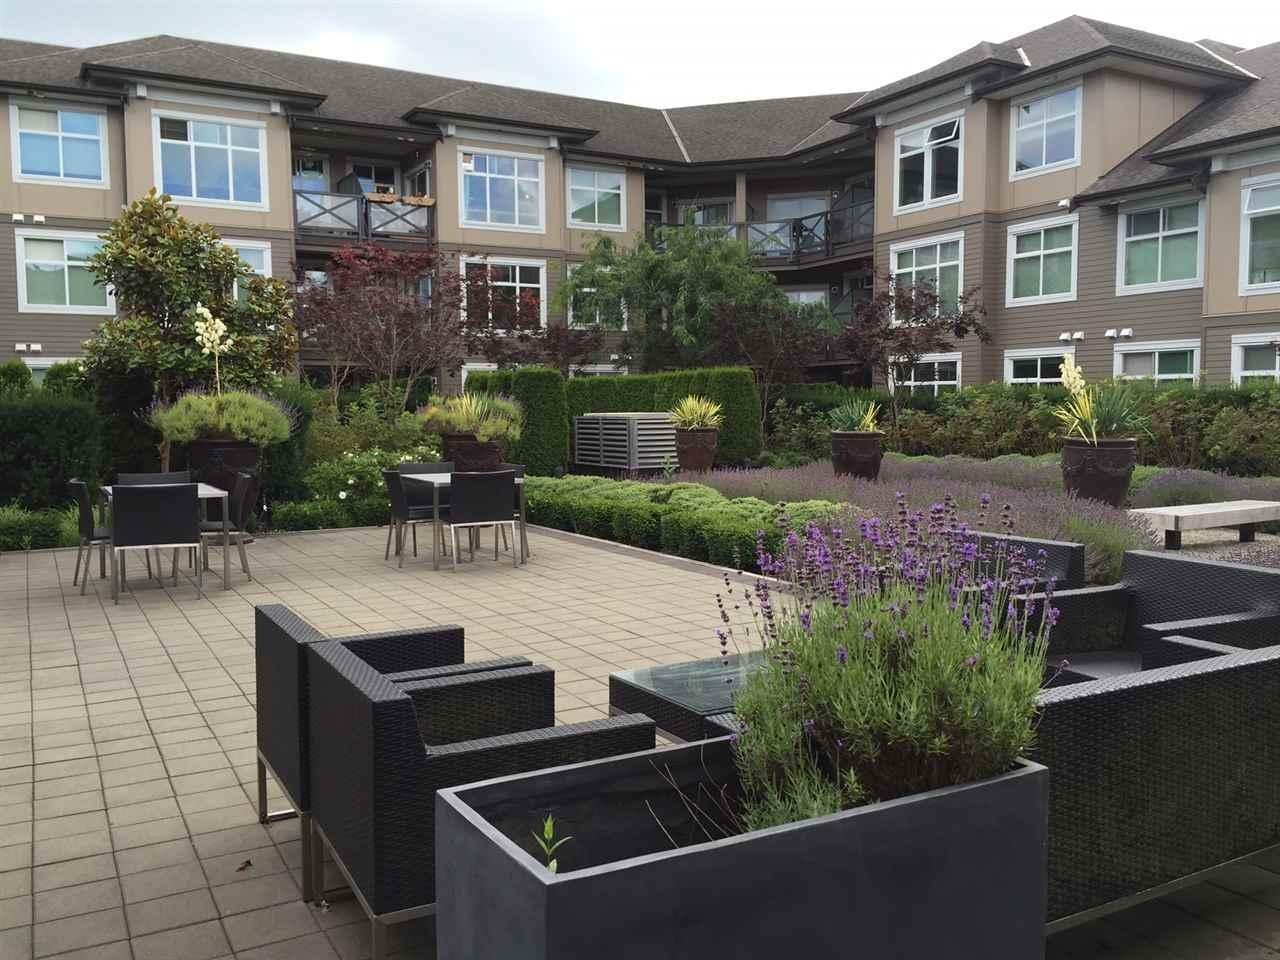 R2091370 - 370 6758 188 STREET, Clayton, Surrey, BC - Apartment Unit